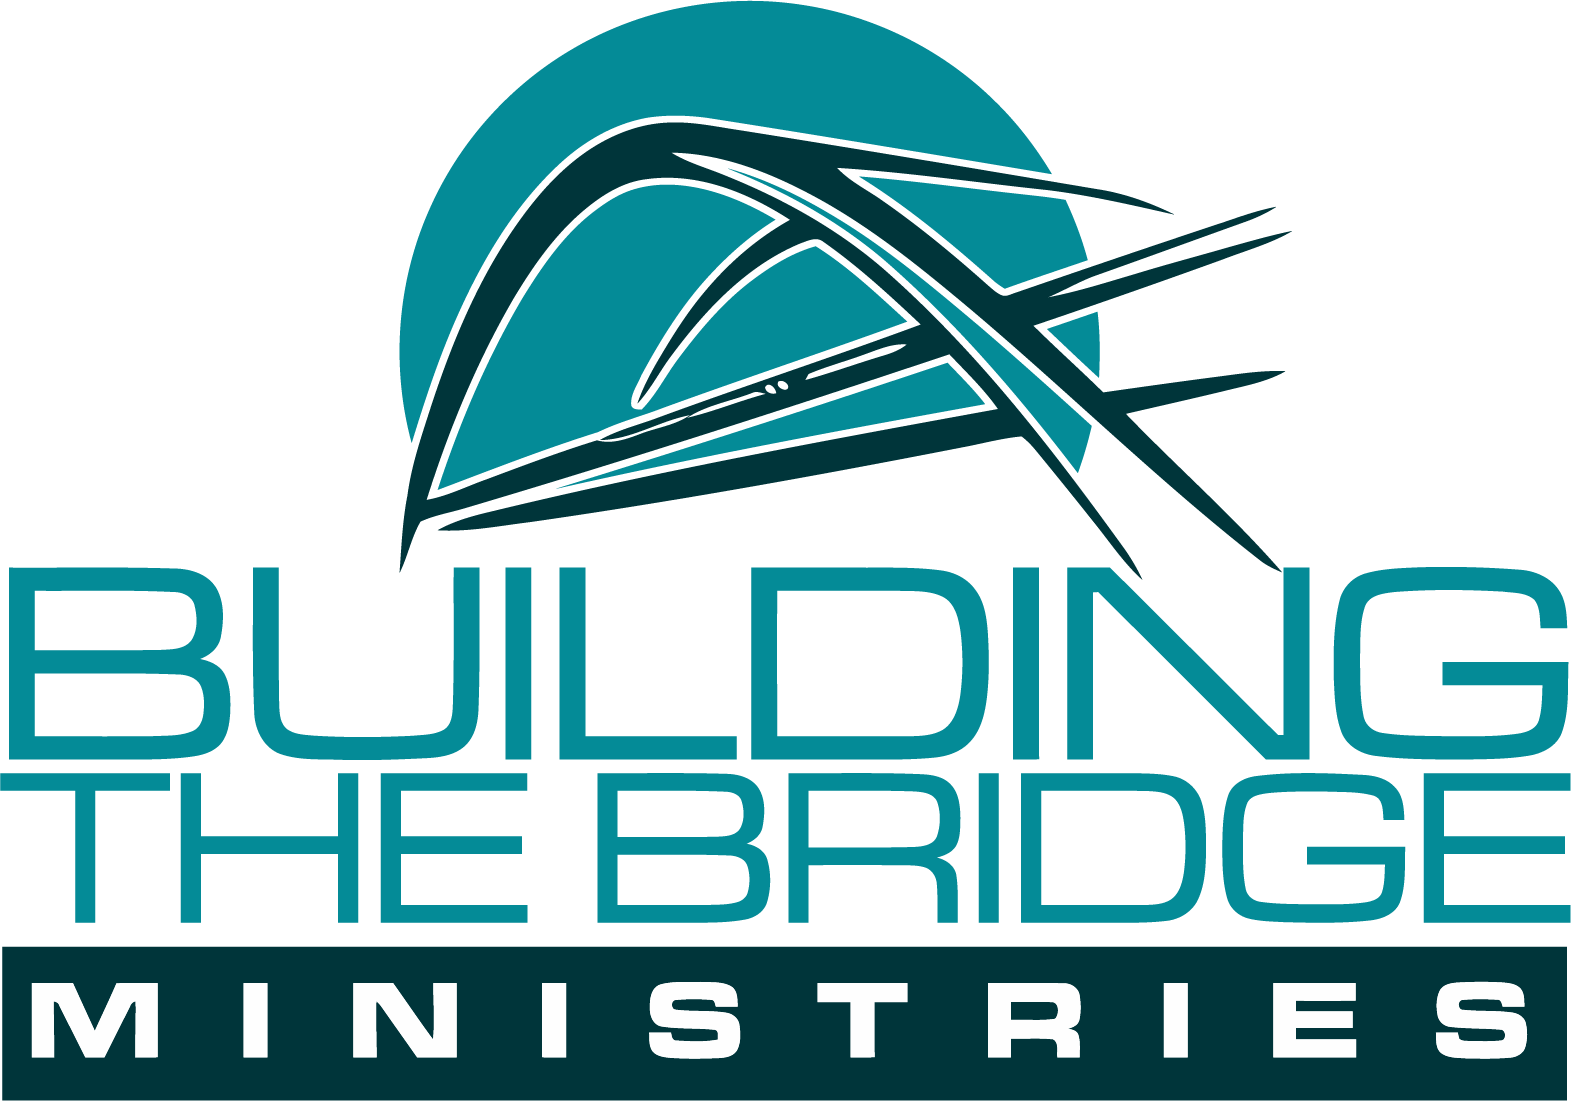 Building the Bridge Ministries